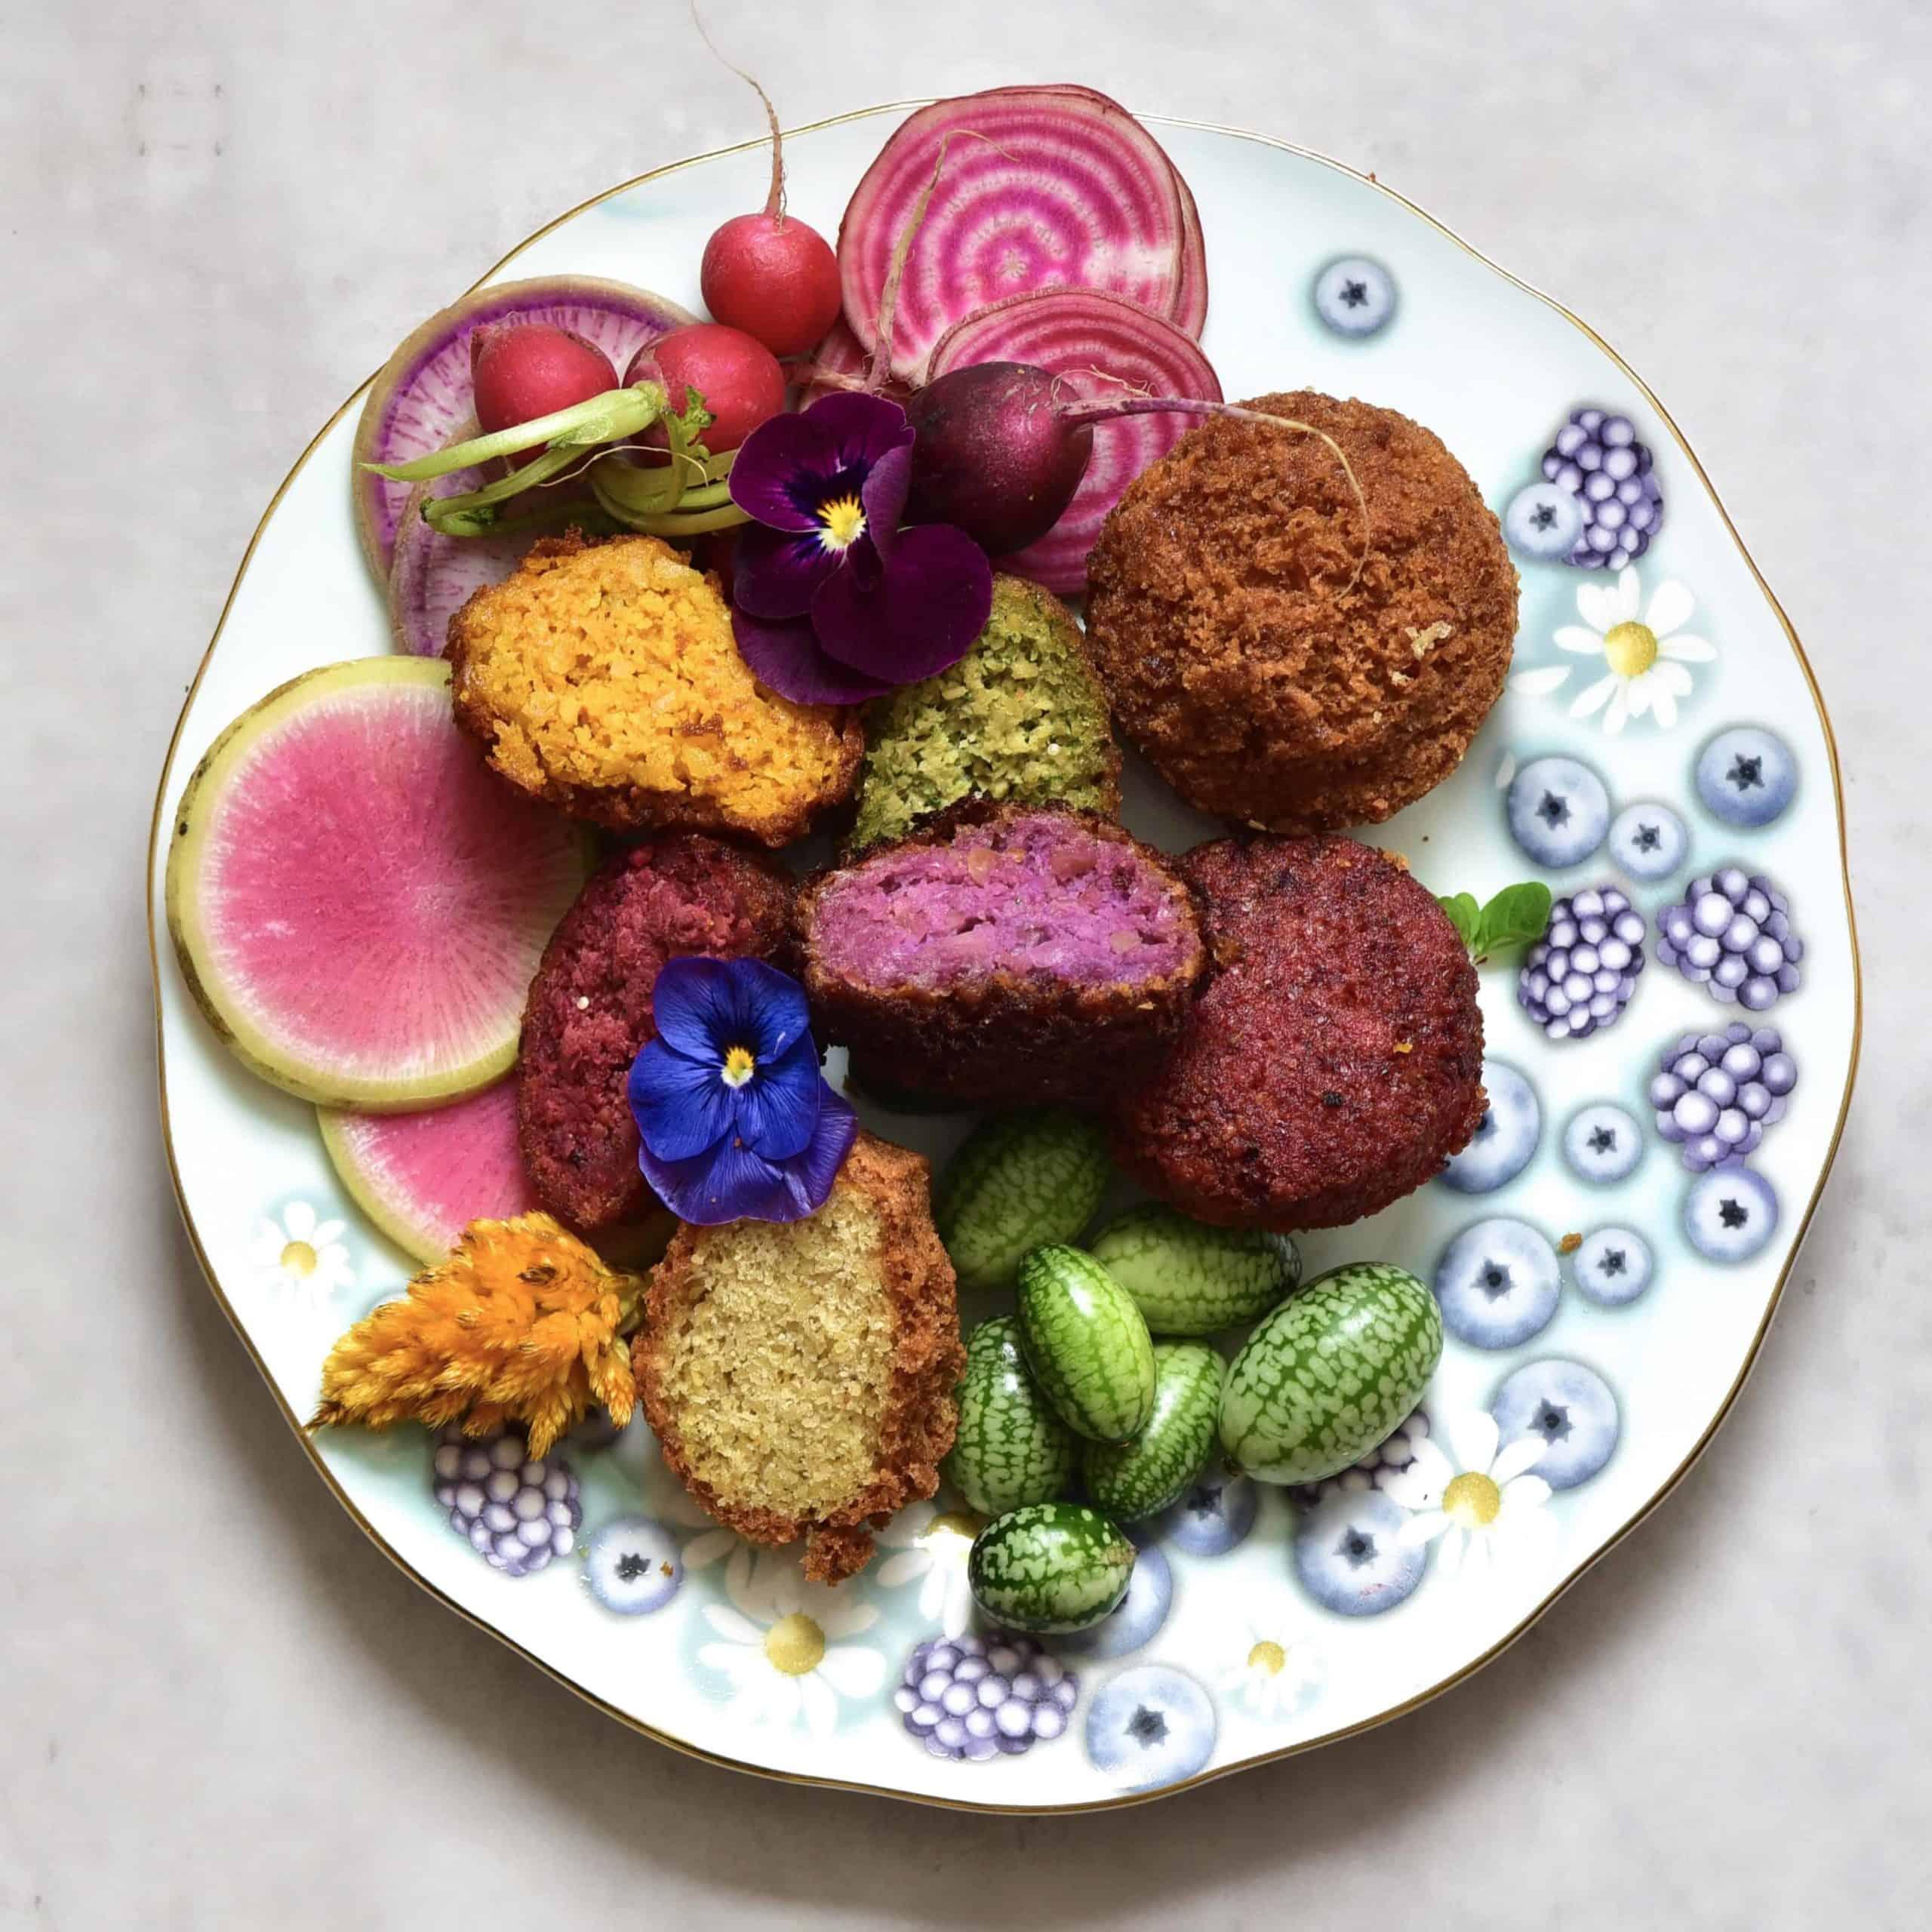 Rainbow vegan falafel